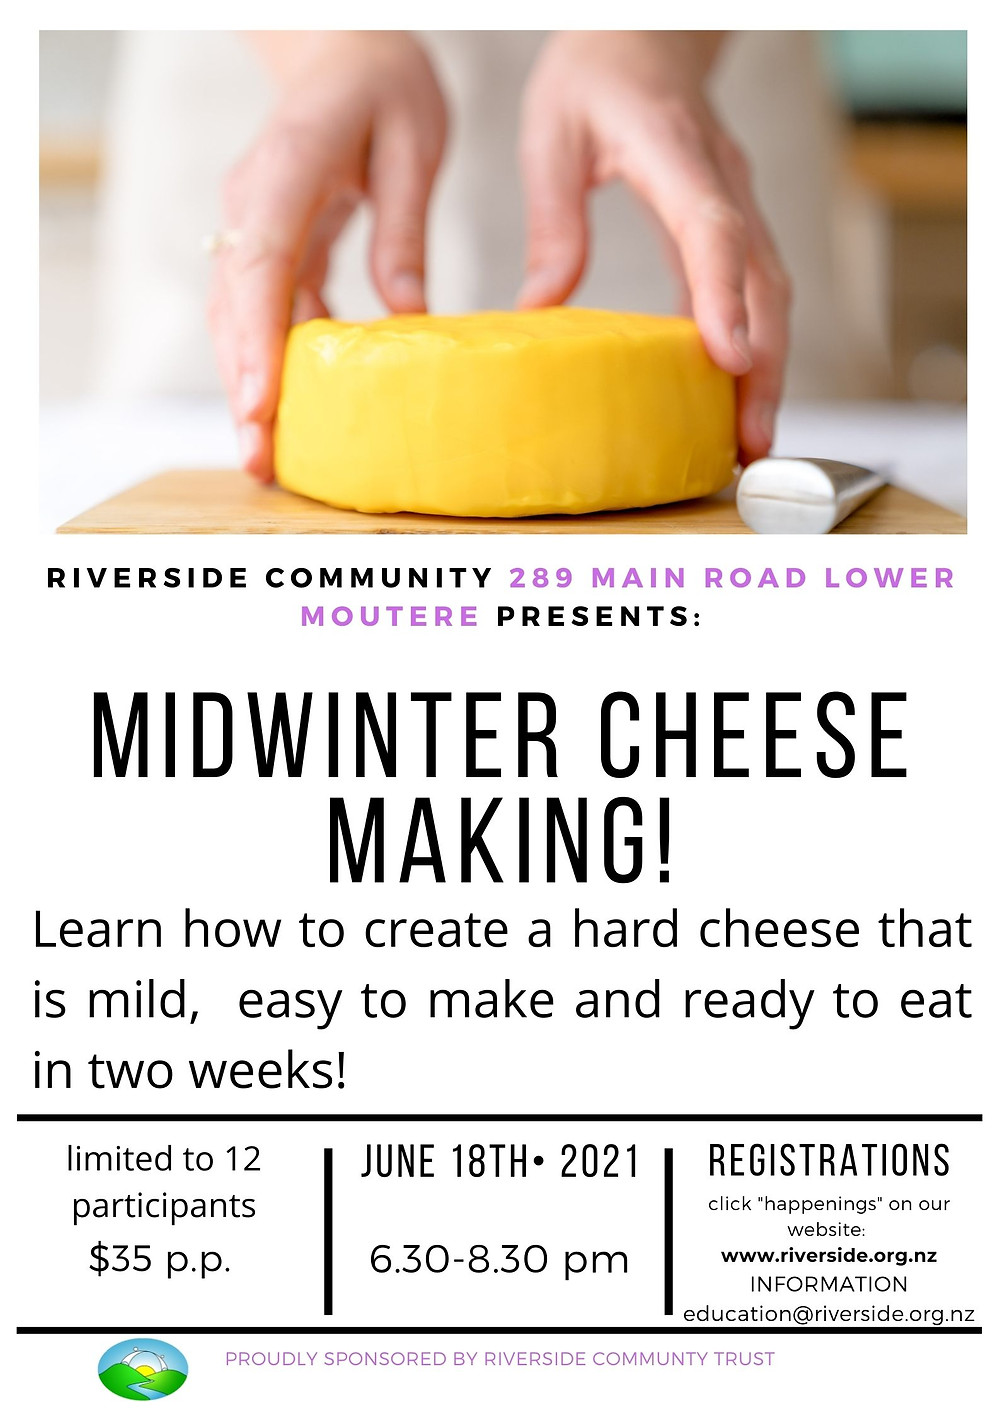 Cheese Making at Riverside - June 2021